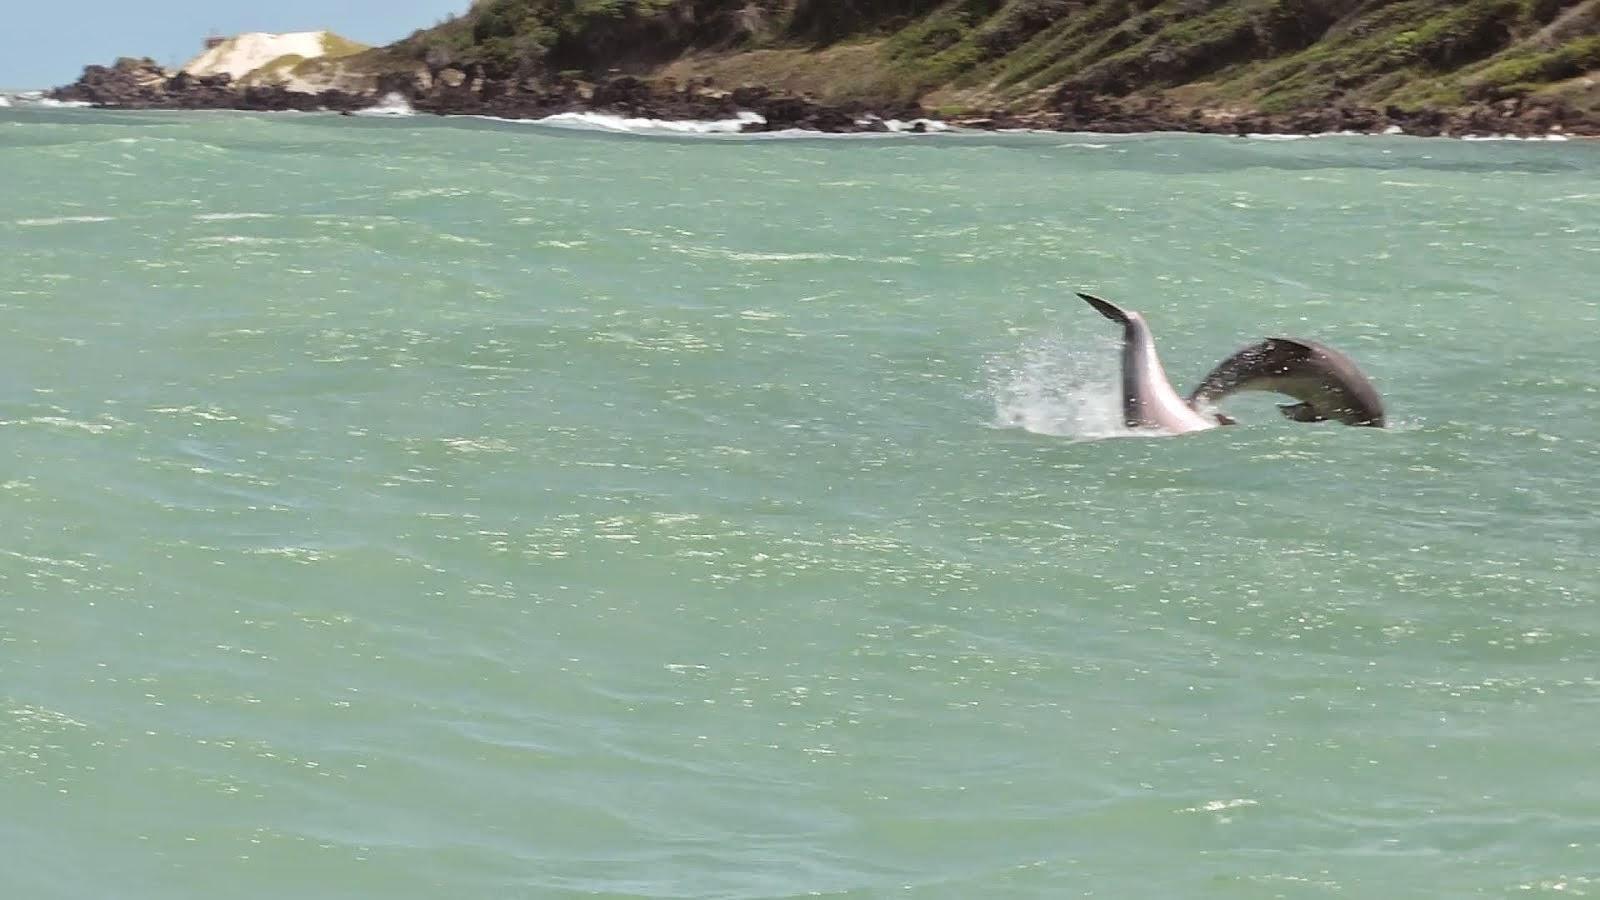 Coco Beach Dolphins